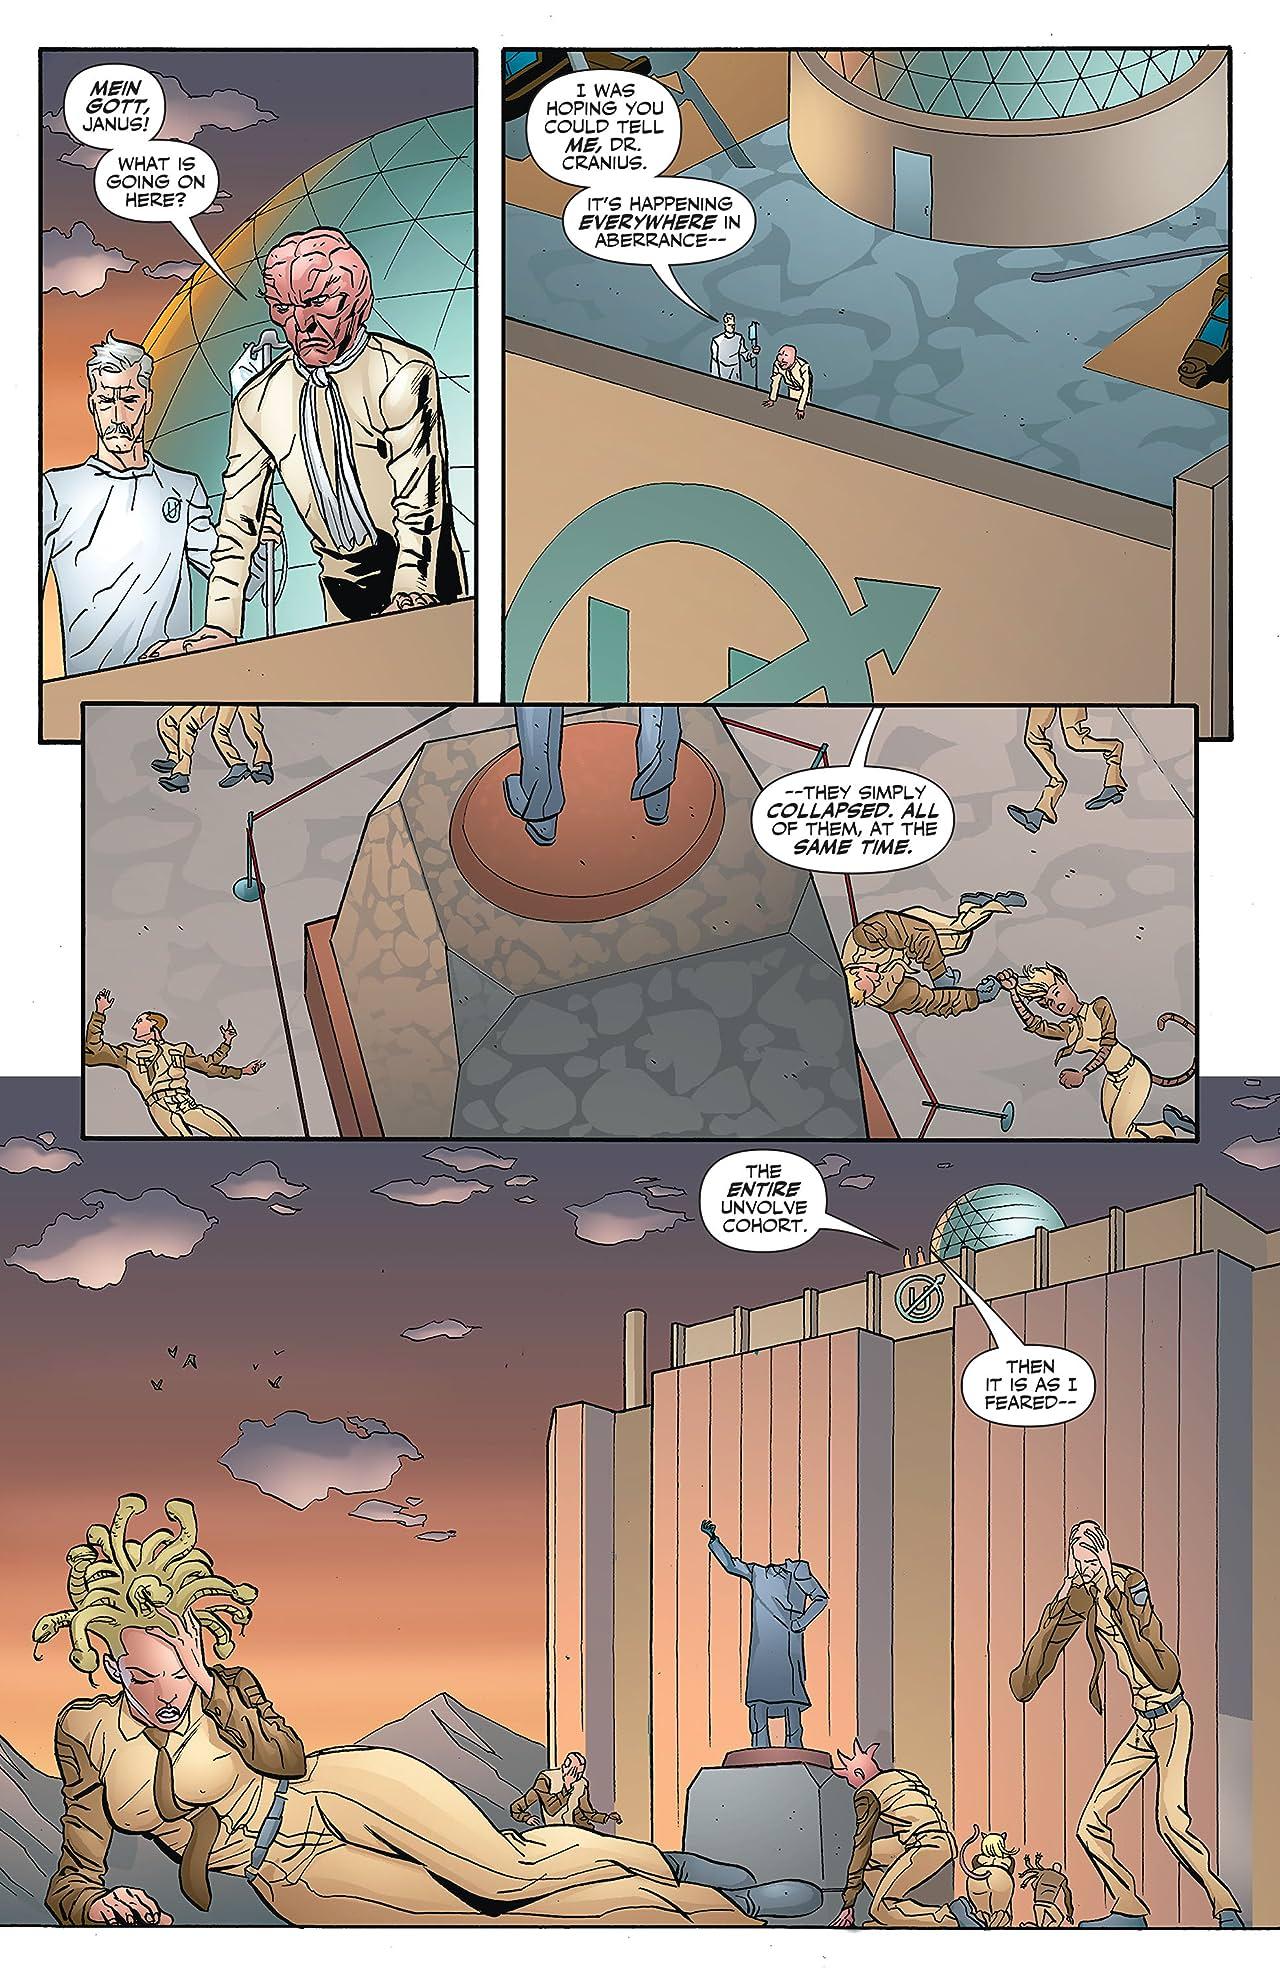 The Un-Men (2007-2008) #5